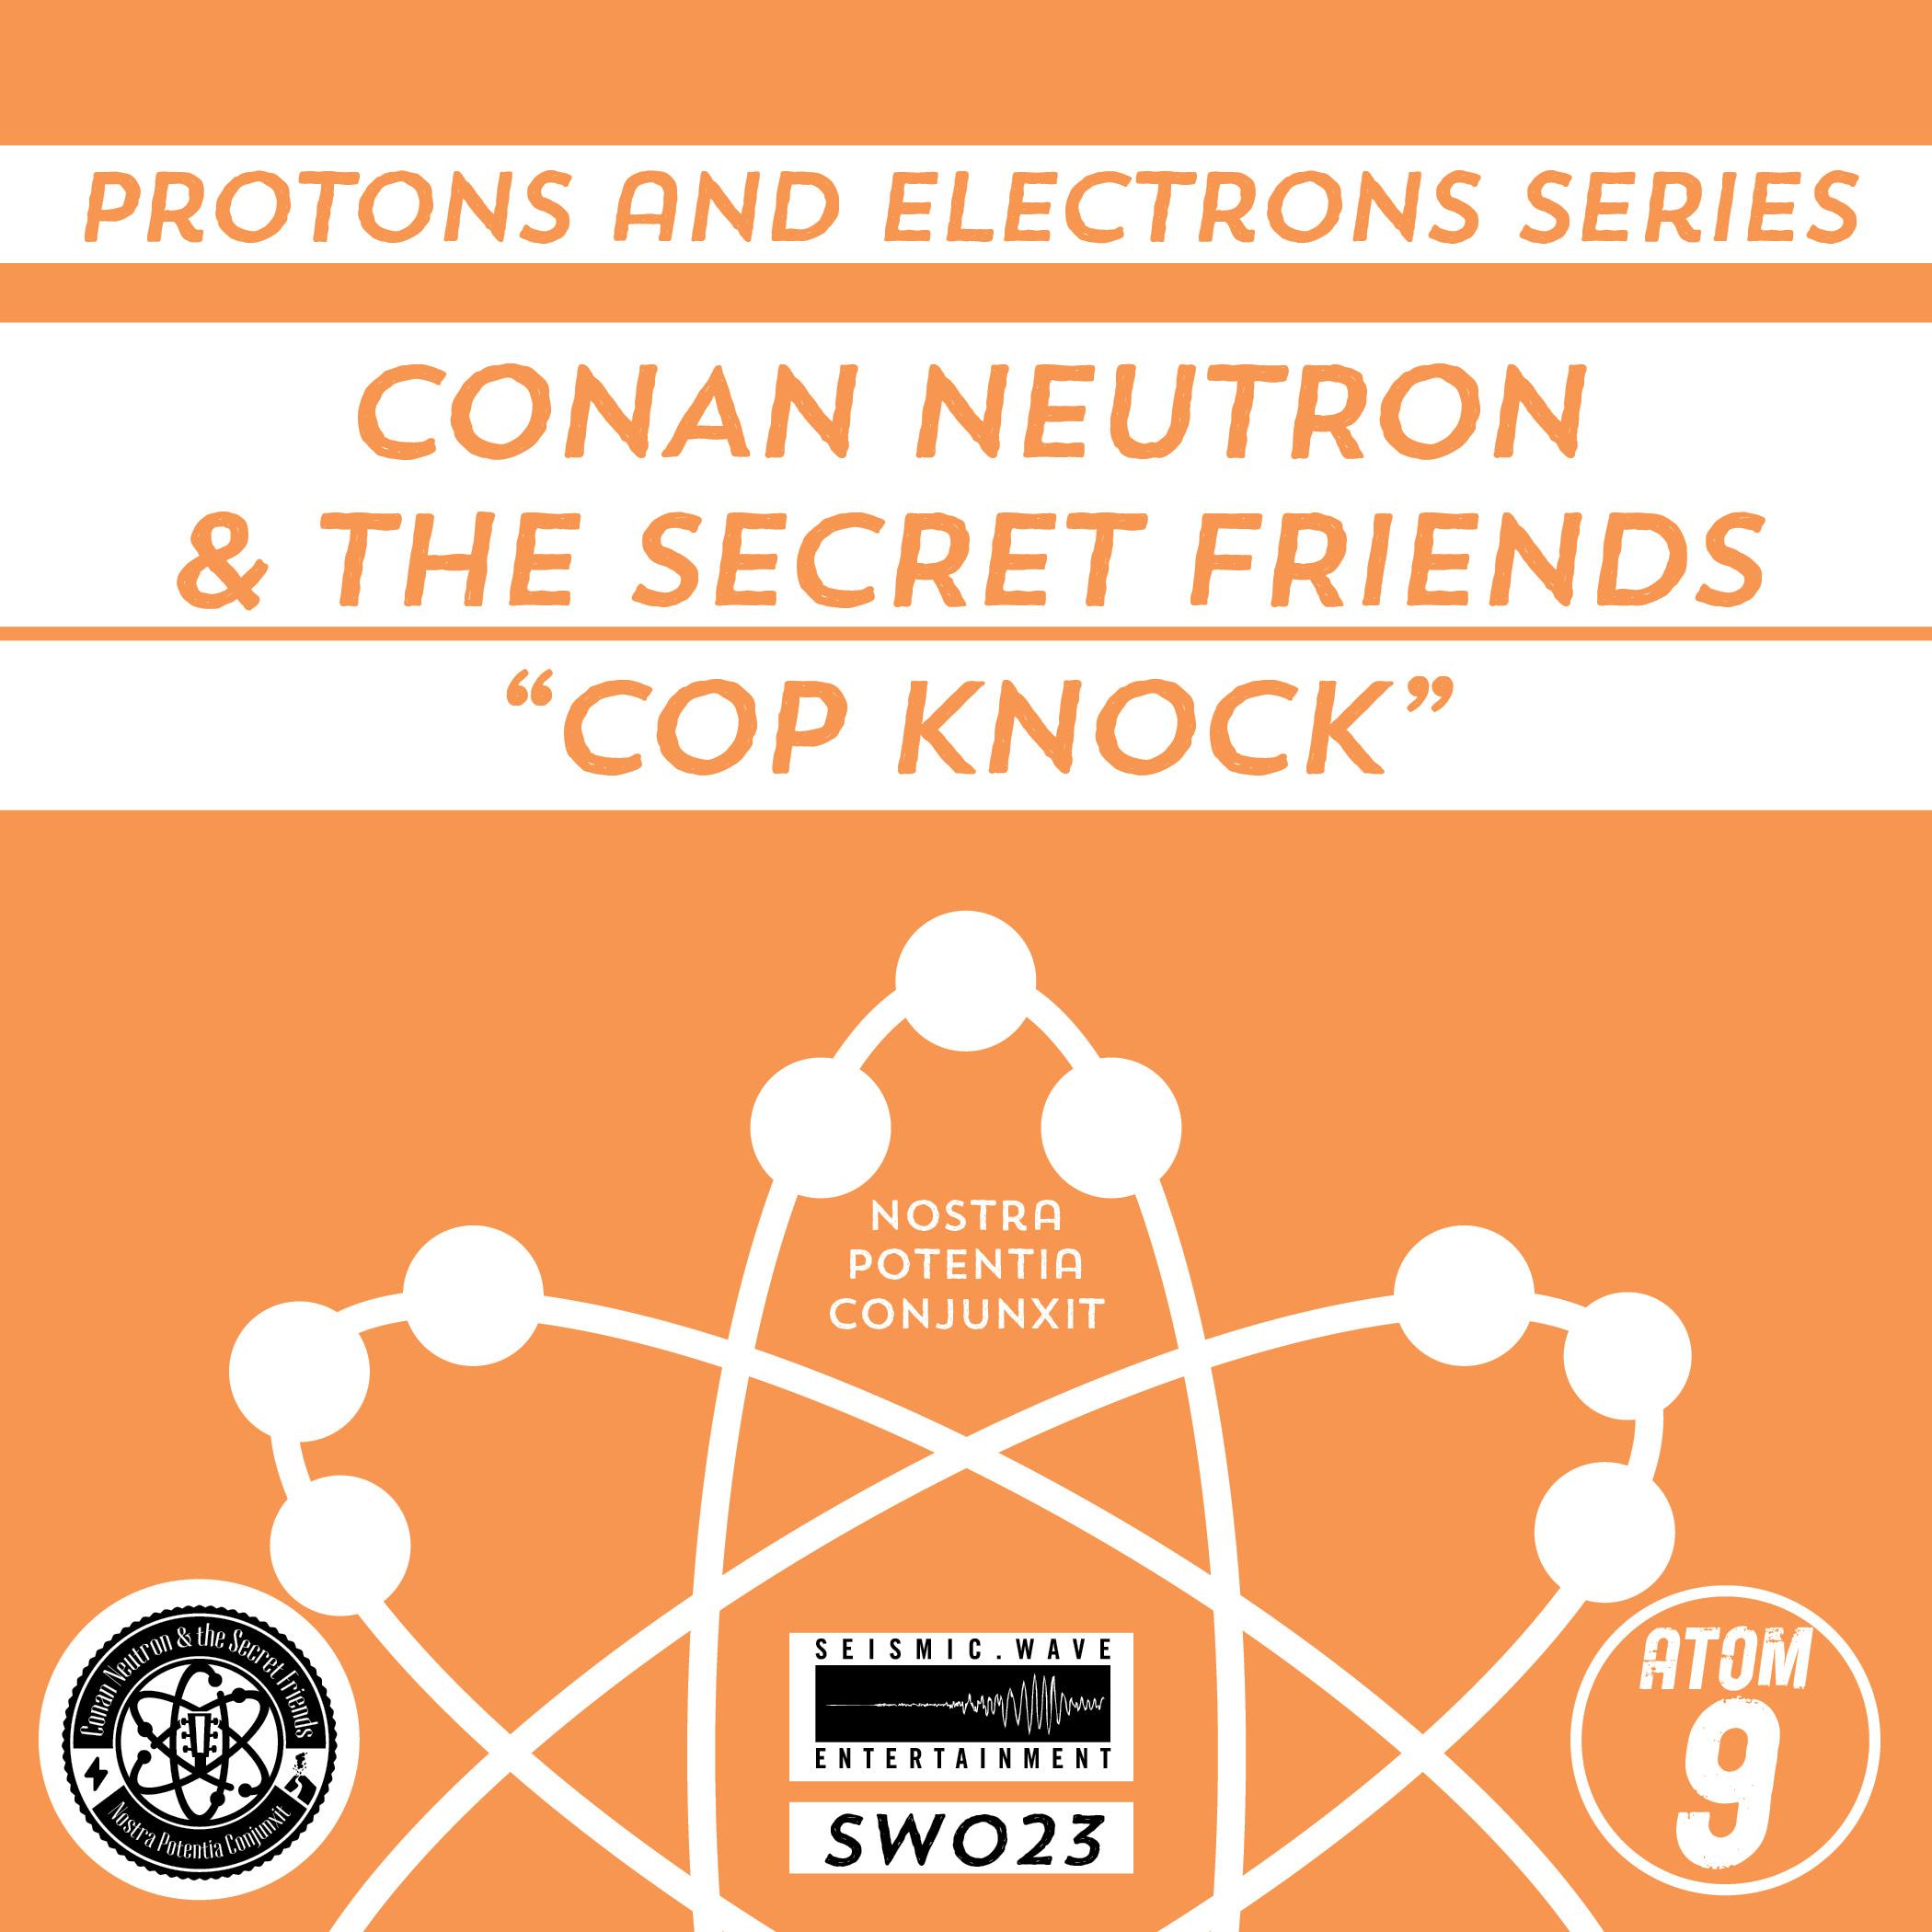 Conan Neutron & the Secret Friends - Cop Knock (Single)  Devices Used:  Cloven Hoof  /  Bit Commander  /  Tone Reaper